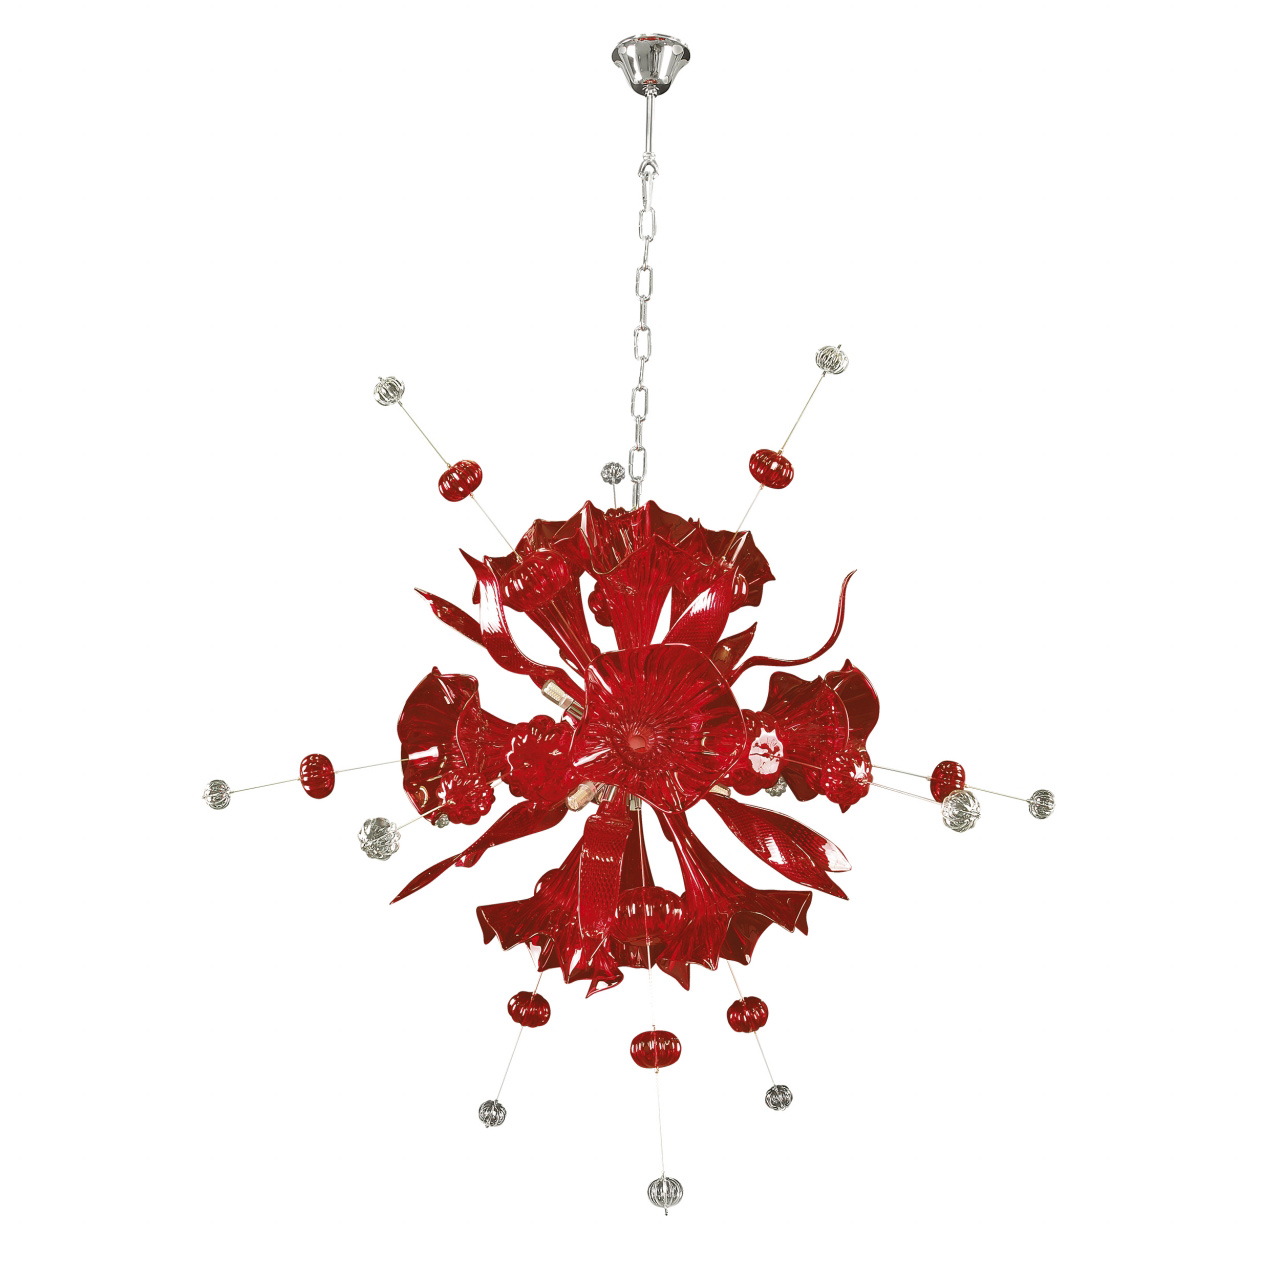 Люстра подвесная Celesta 12х6W (Led) G9 красный Lightstar 893122